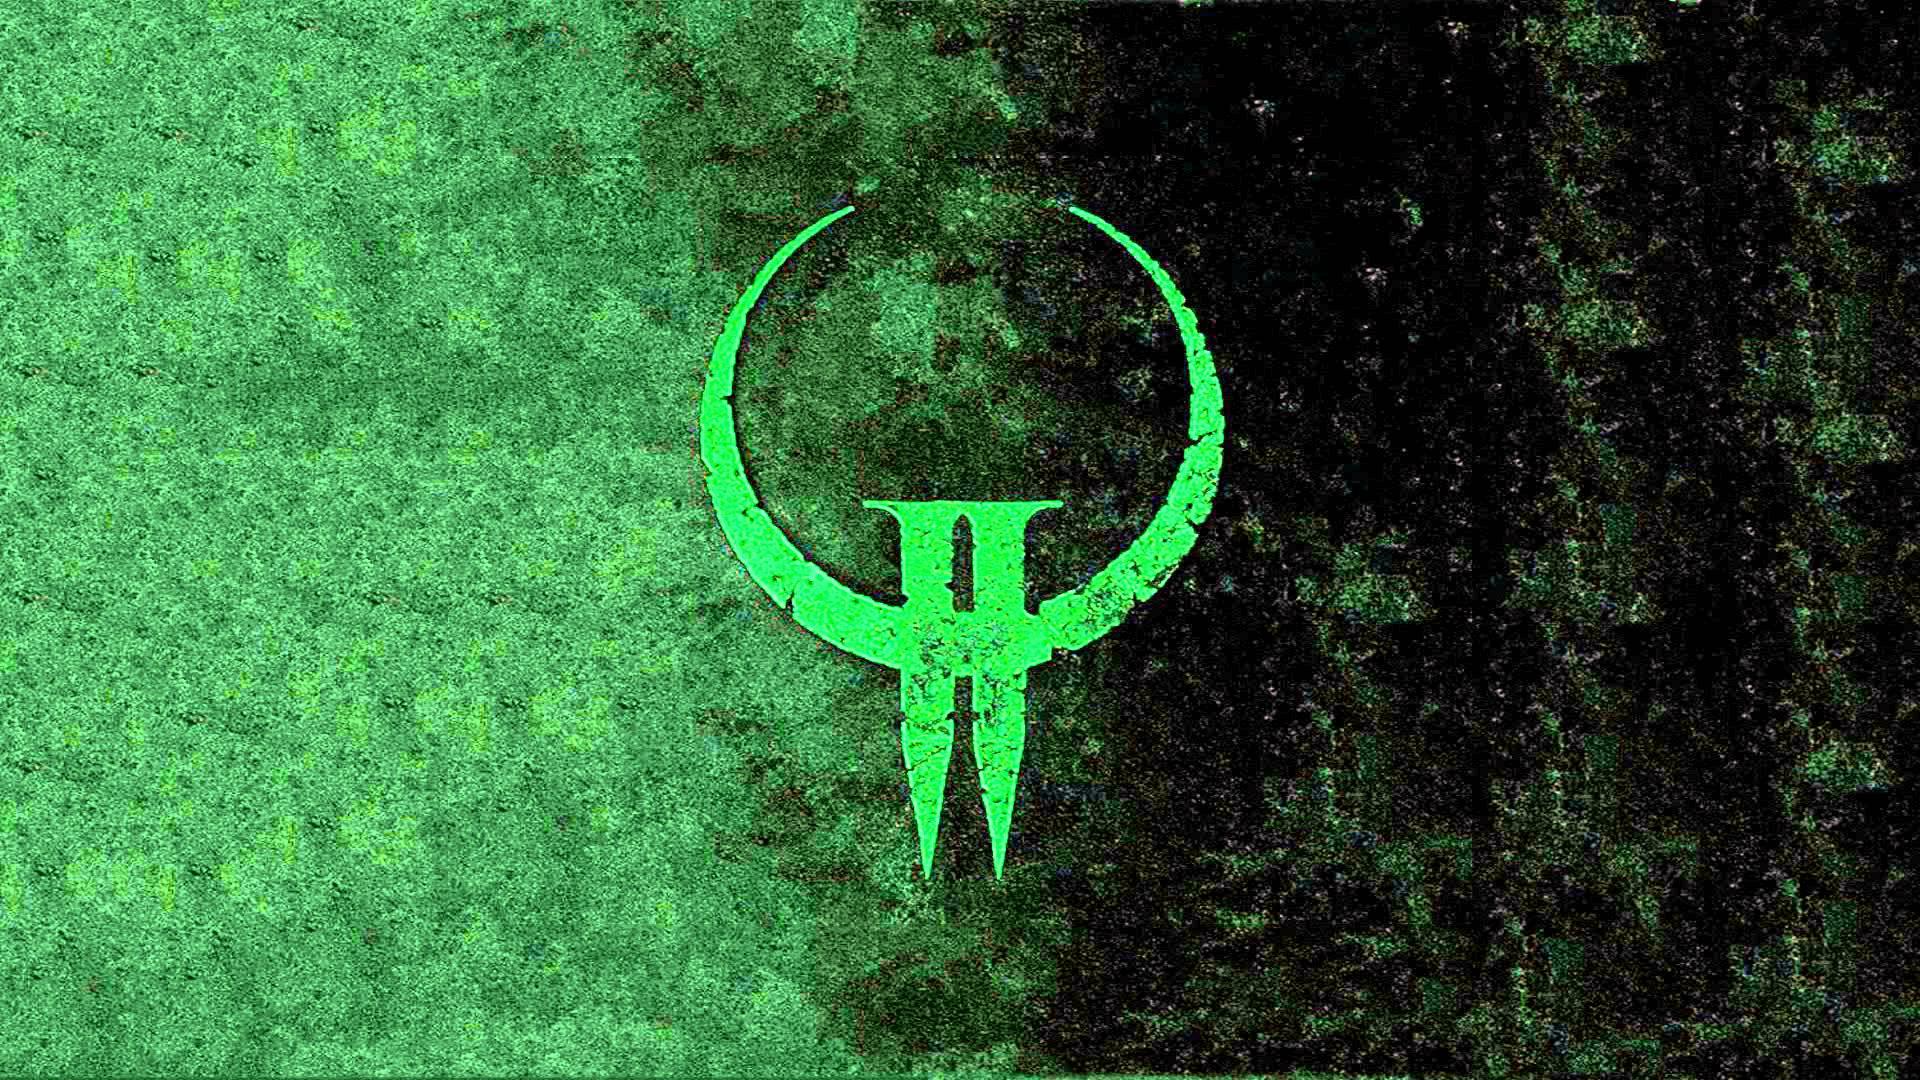 vkQuake 2, Quake 2 on Vulkan API, is available for download